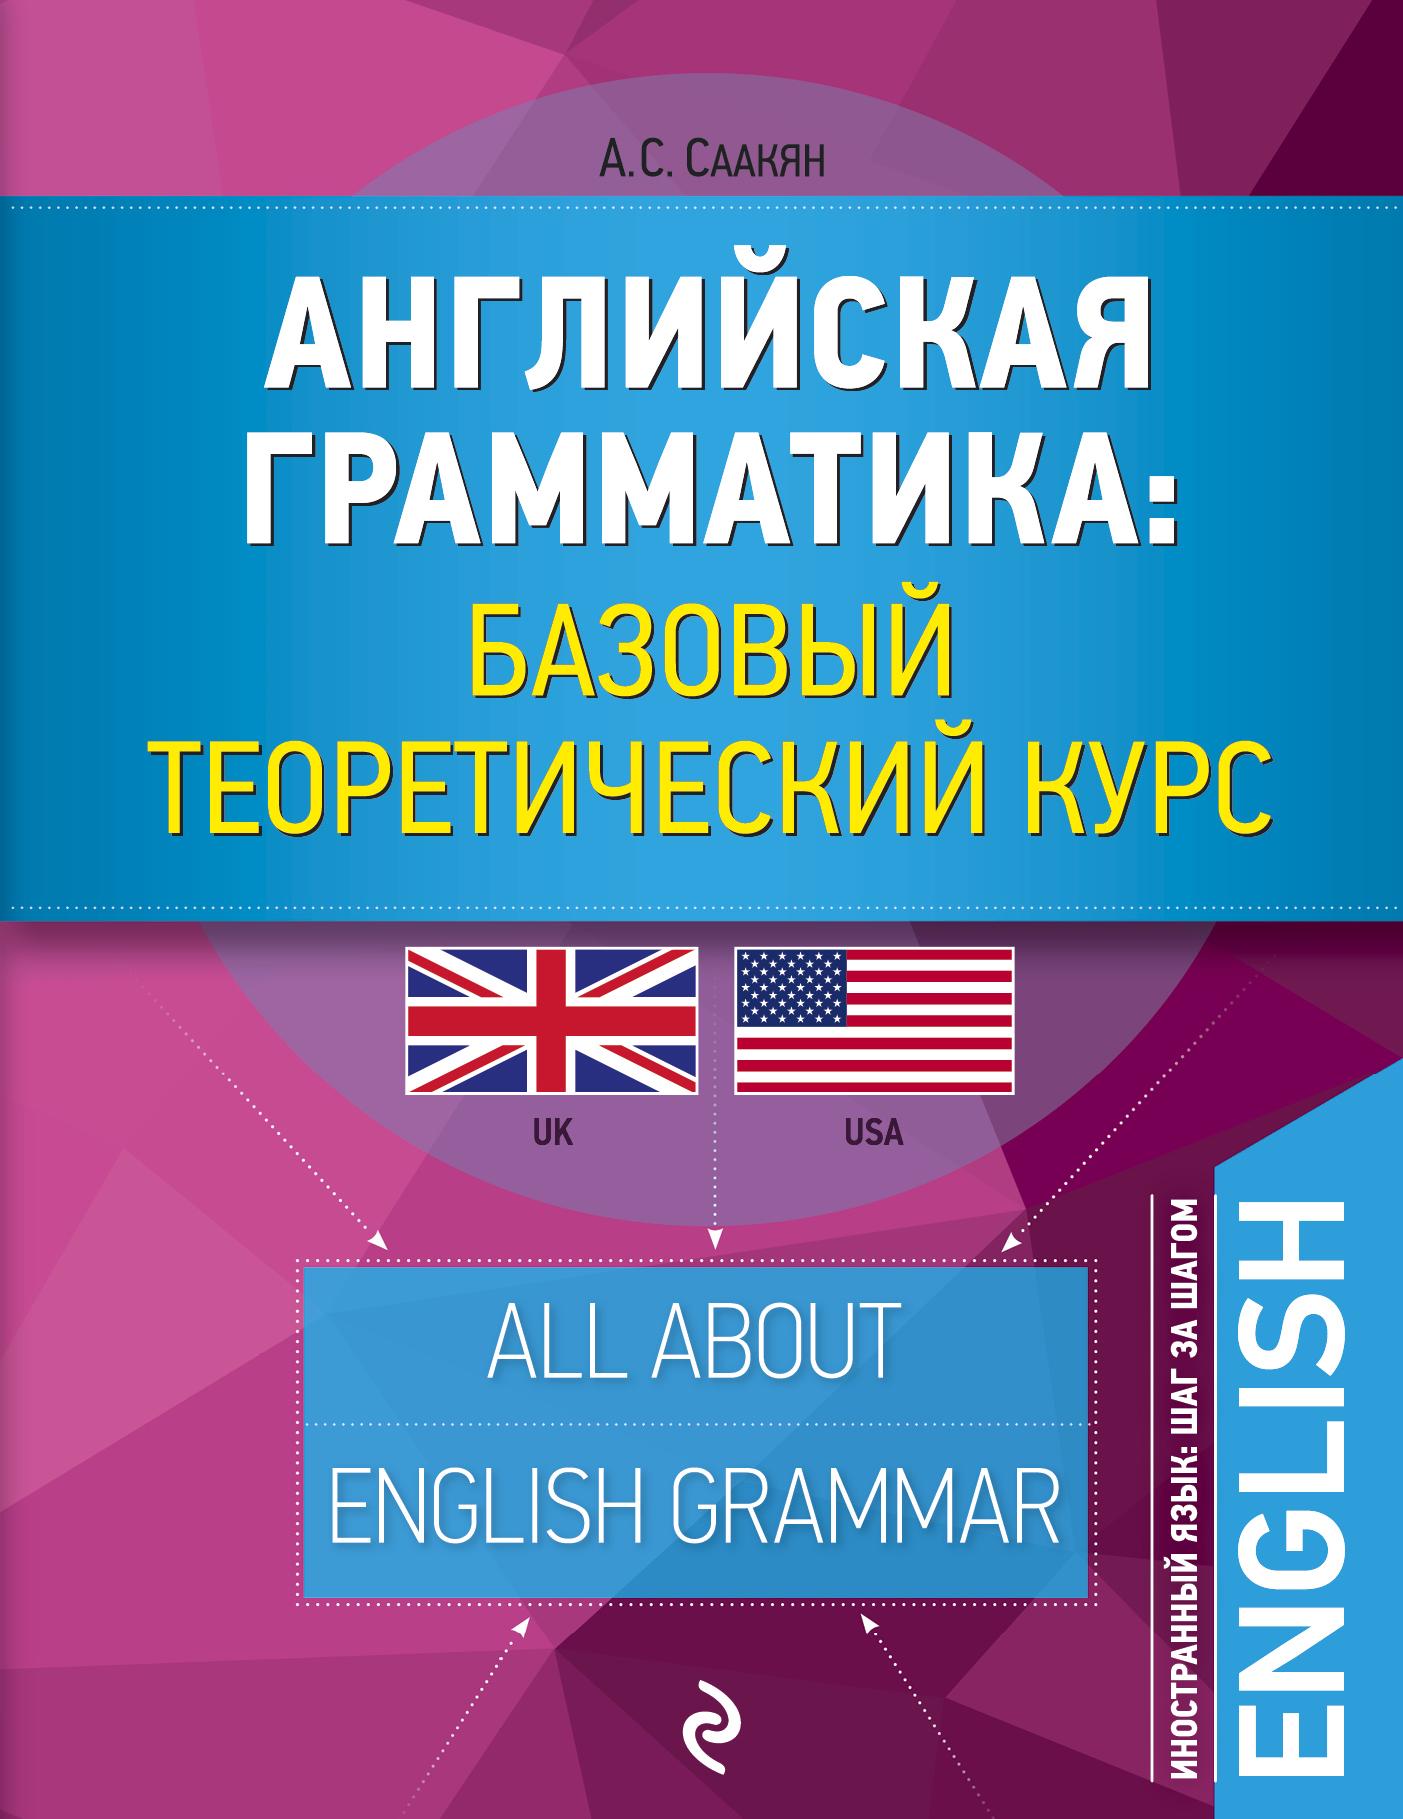 Саакян А.С. Английская грамматика: базовый теоретический курс